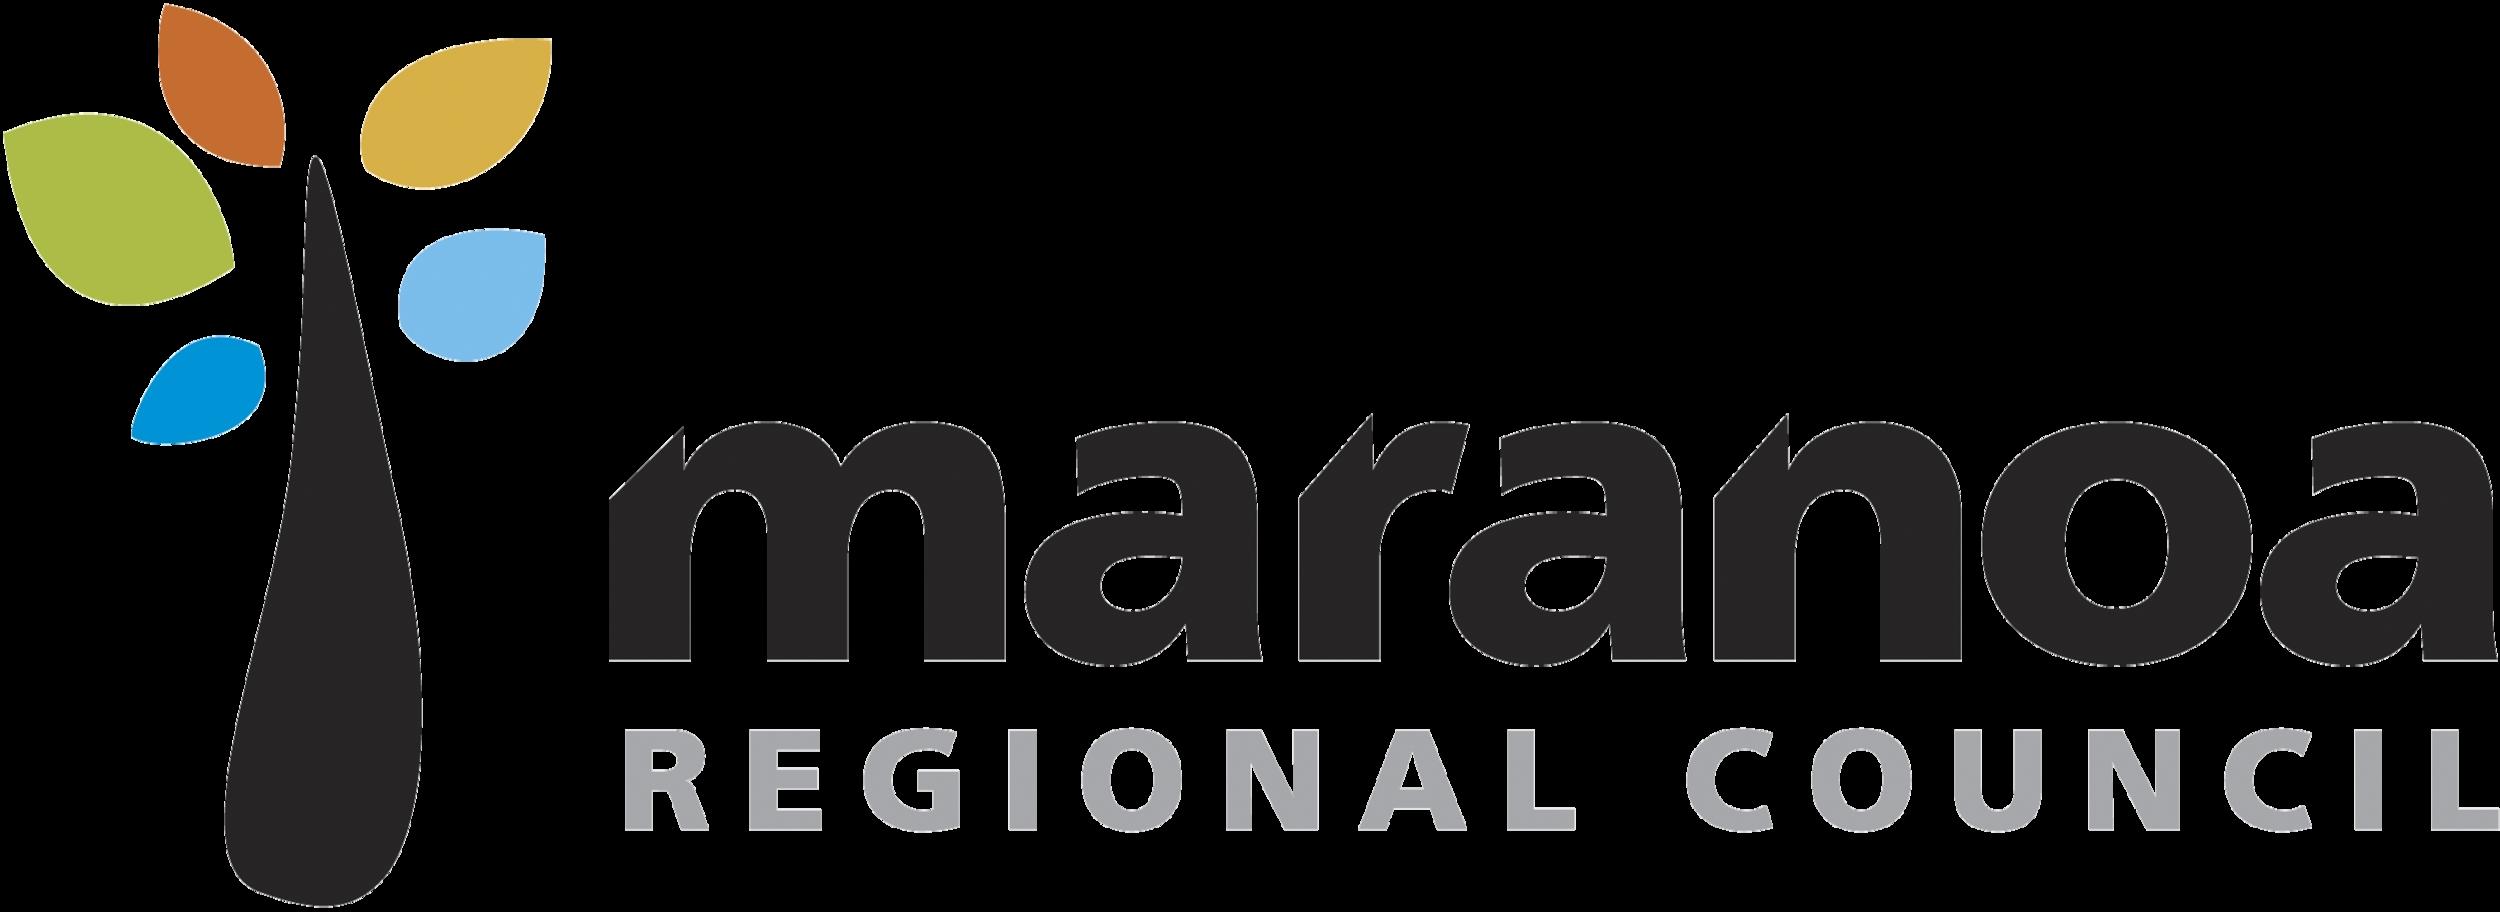 Client-Logos-MRC.png